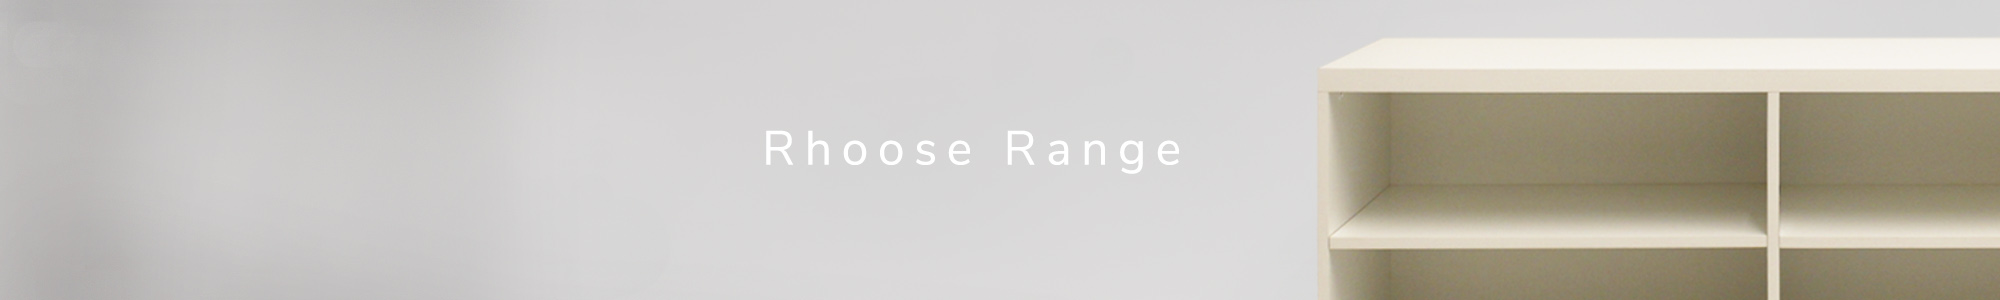 Rhoose